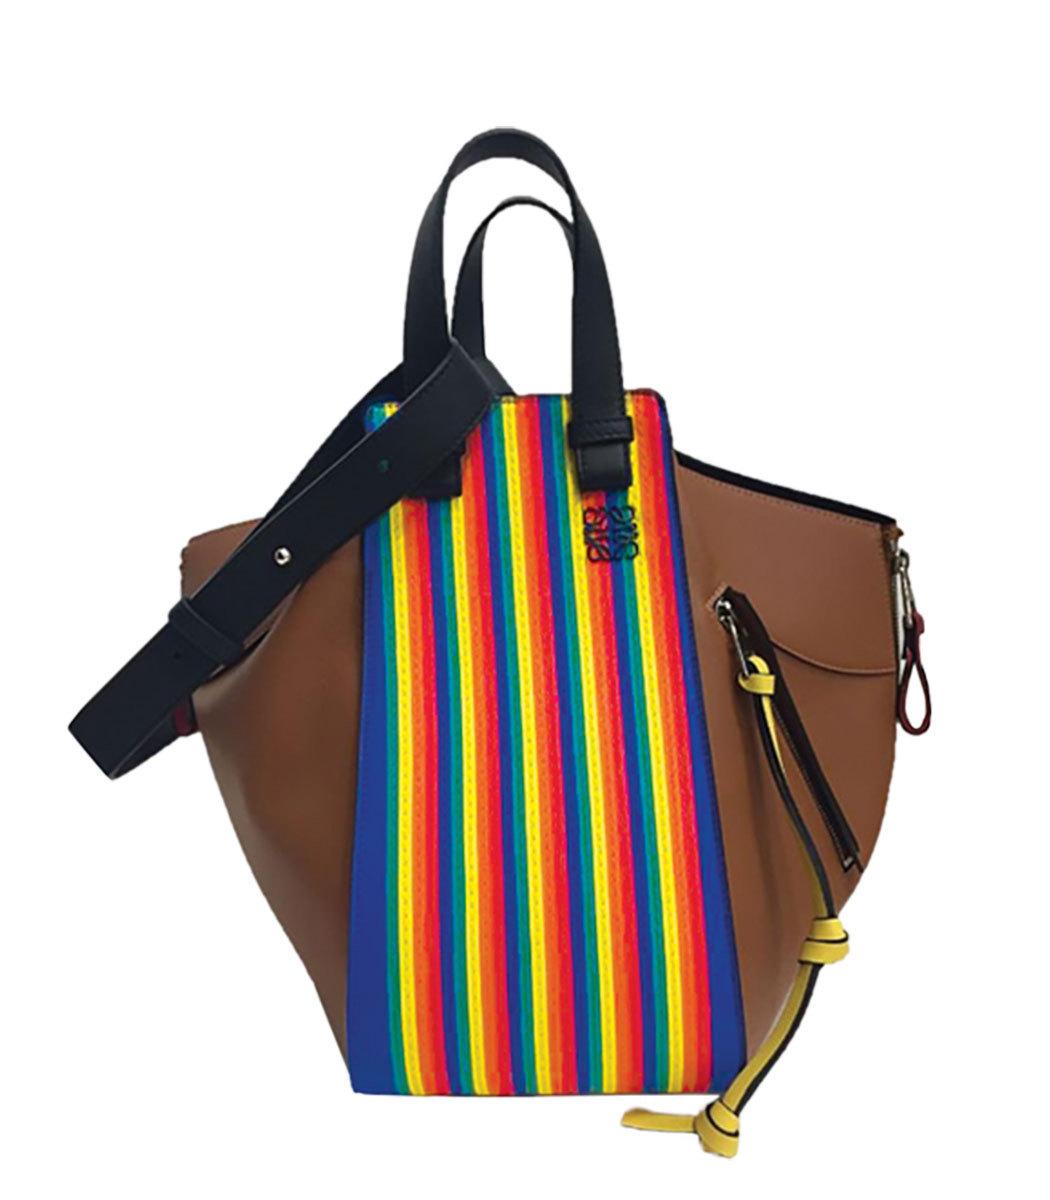 Medium Rainbow Hammock Calfskin Leather Shoulder Bag - Brown, Multicolor/Tan